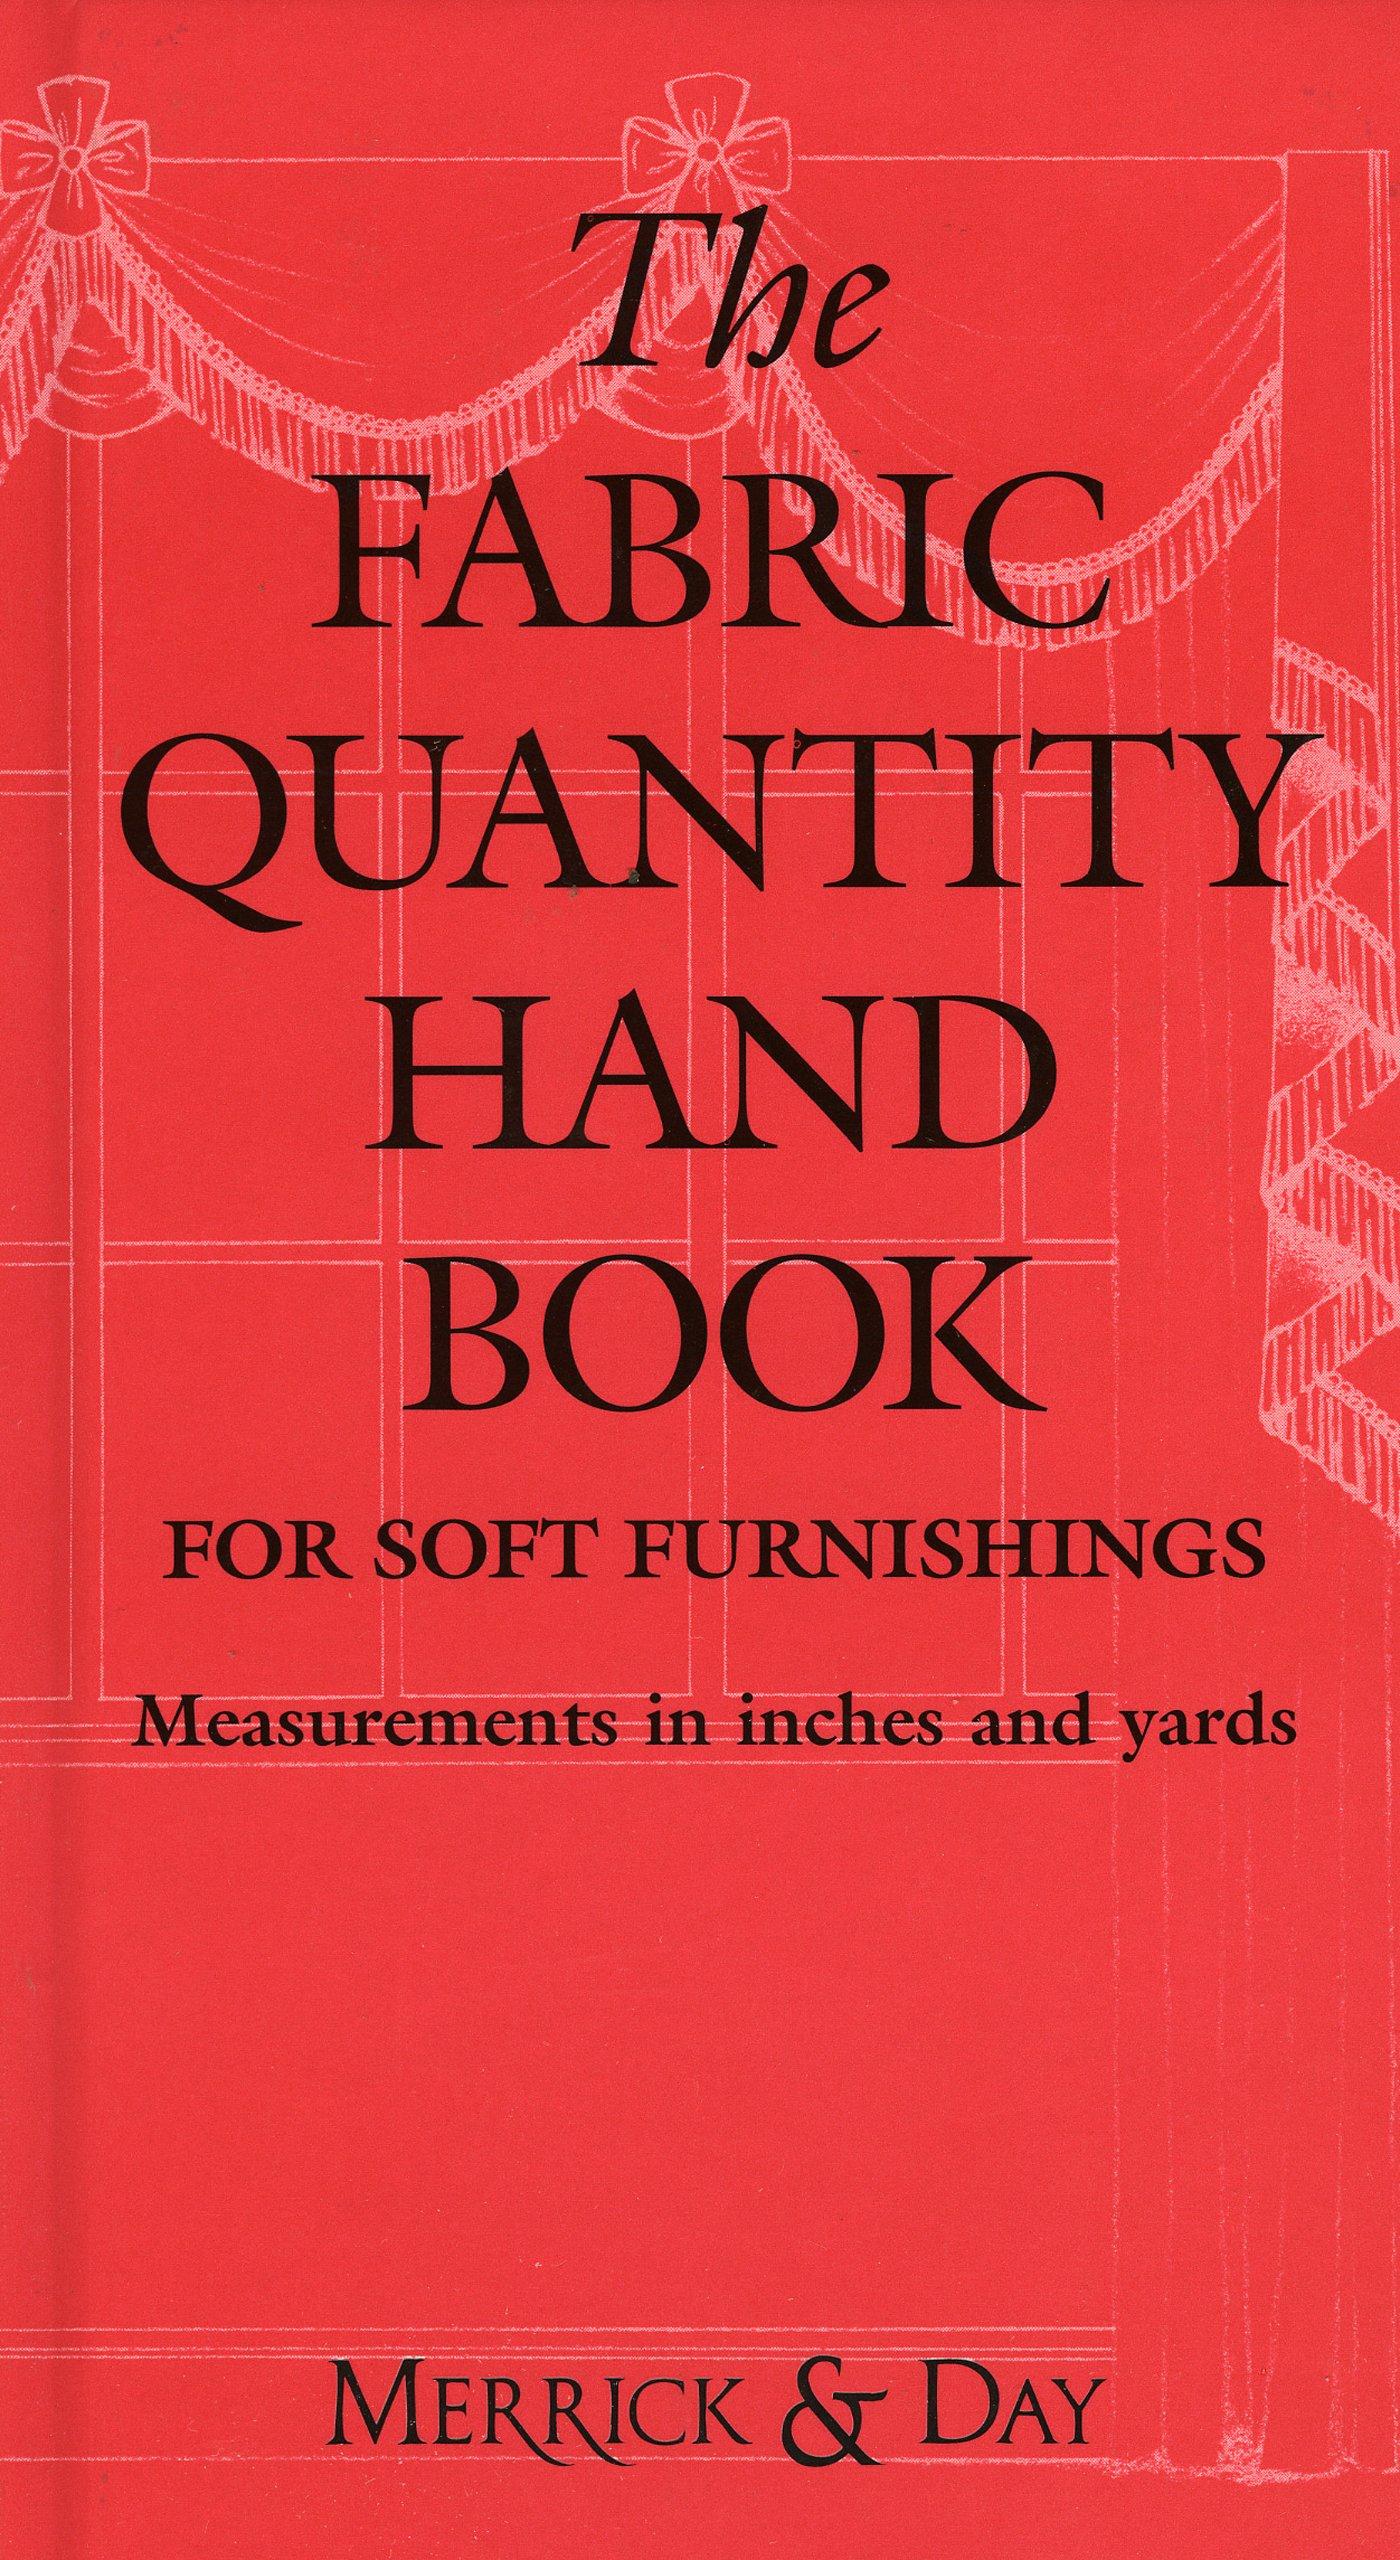 Fabric quantity handbook inchesyards catherine merrick fabric quantity handbook inchesyards catherine merrick 9780953526727 amazon books nvjuhfo Choice Image